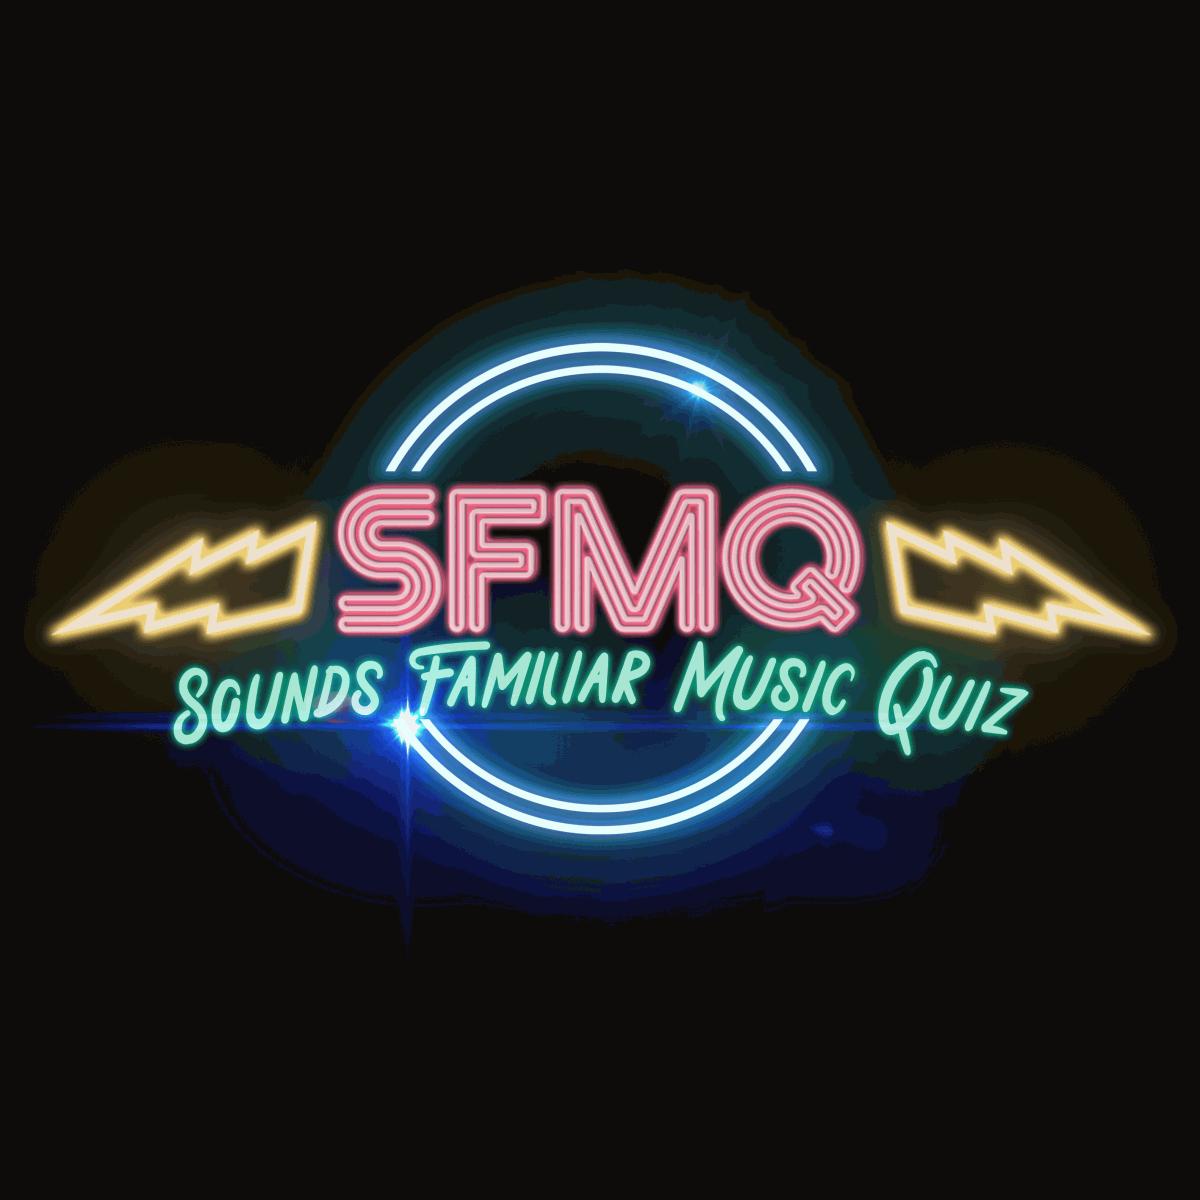 Sounds Familiar Music Quiz | DesignMyNight